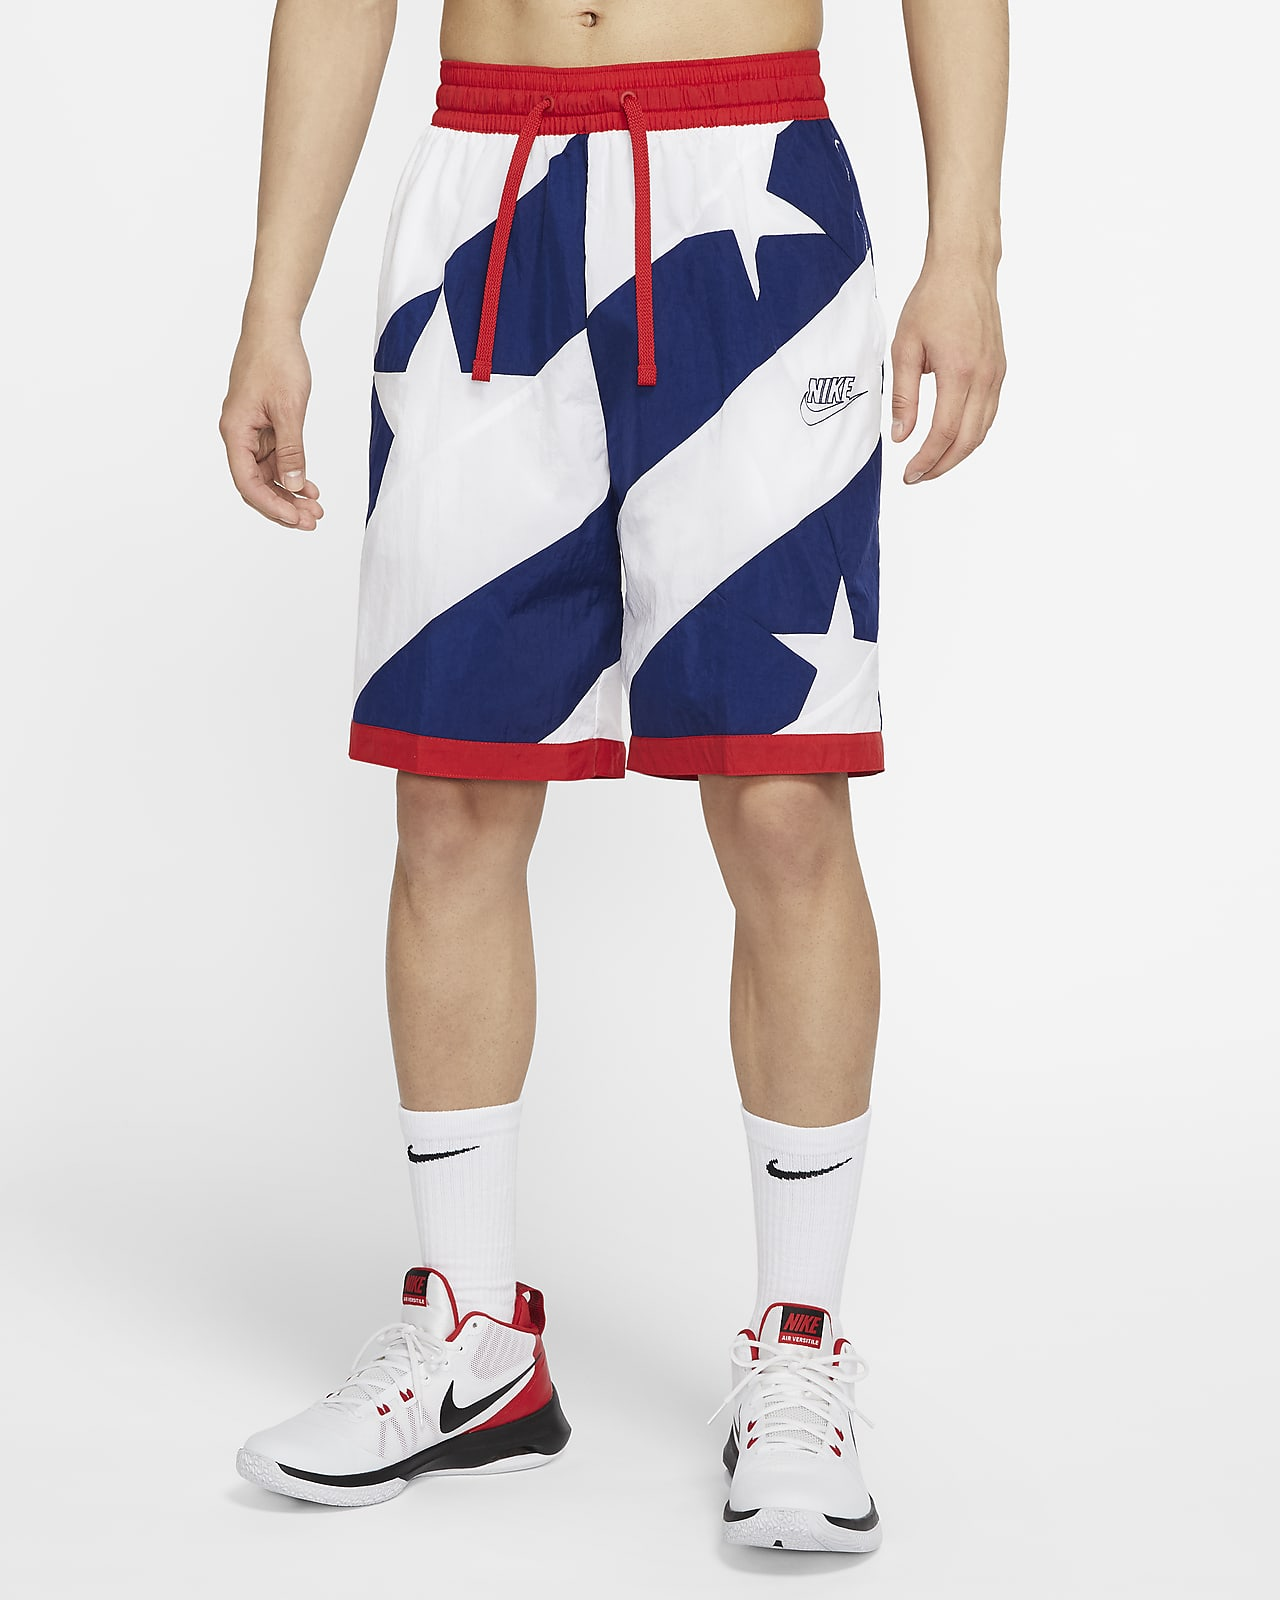 Nike Dri-FIT Throwback Men's Basketball